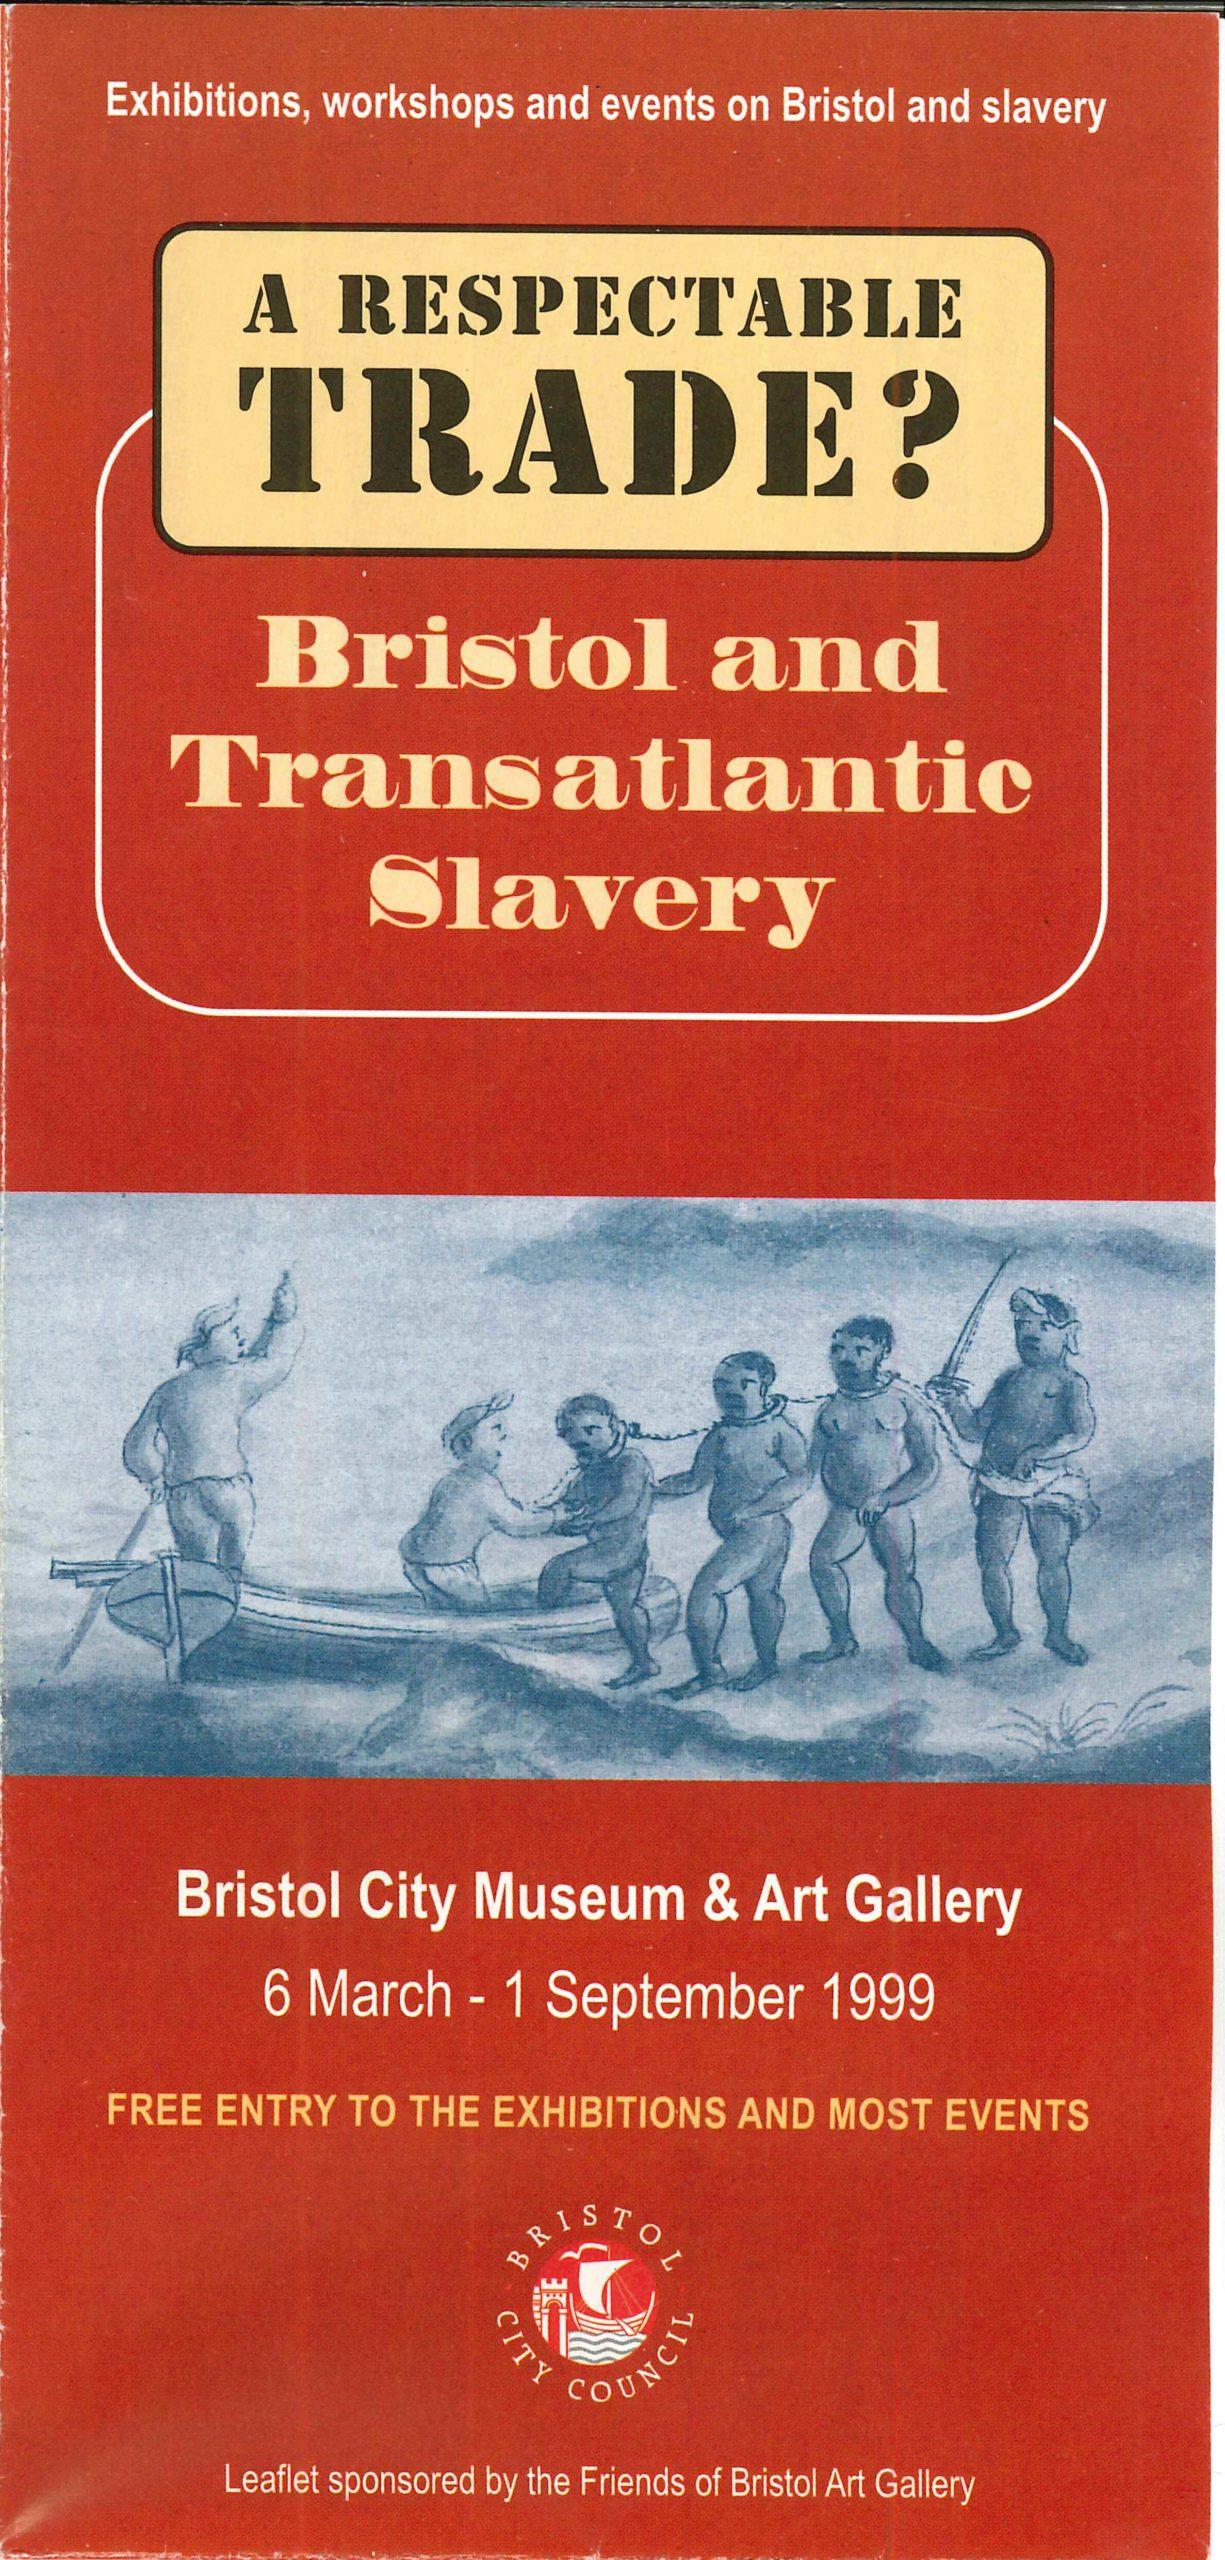 'A Respectable Trade? Bristol and Transatlantic Slavery' exhibition leaflet cover, 1999.